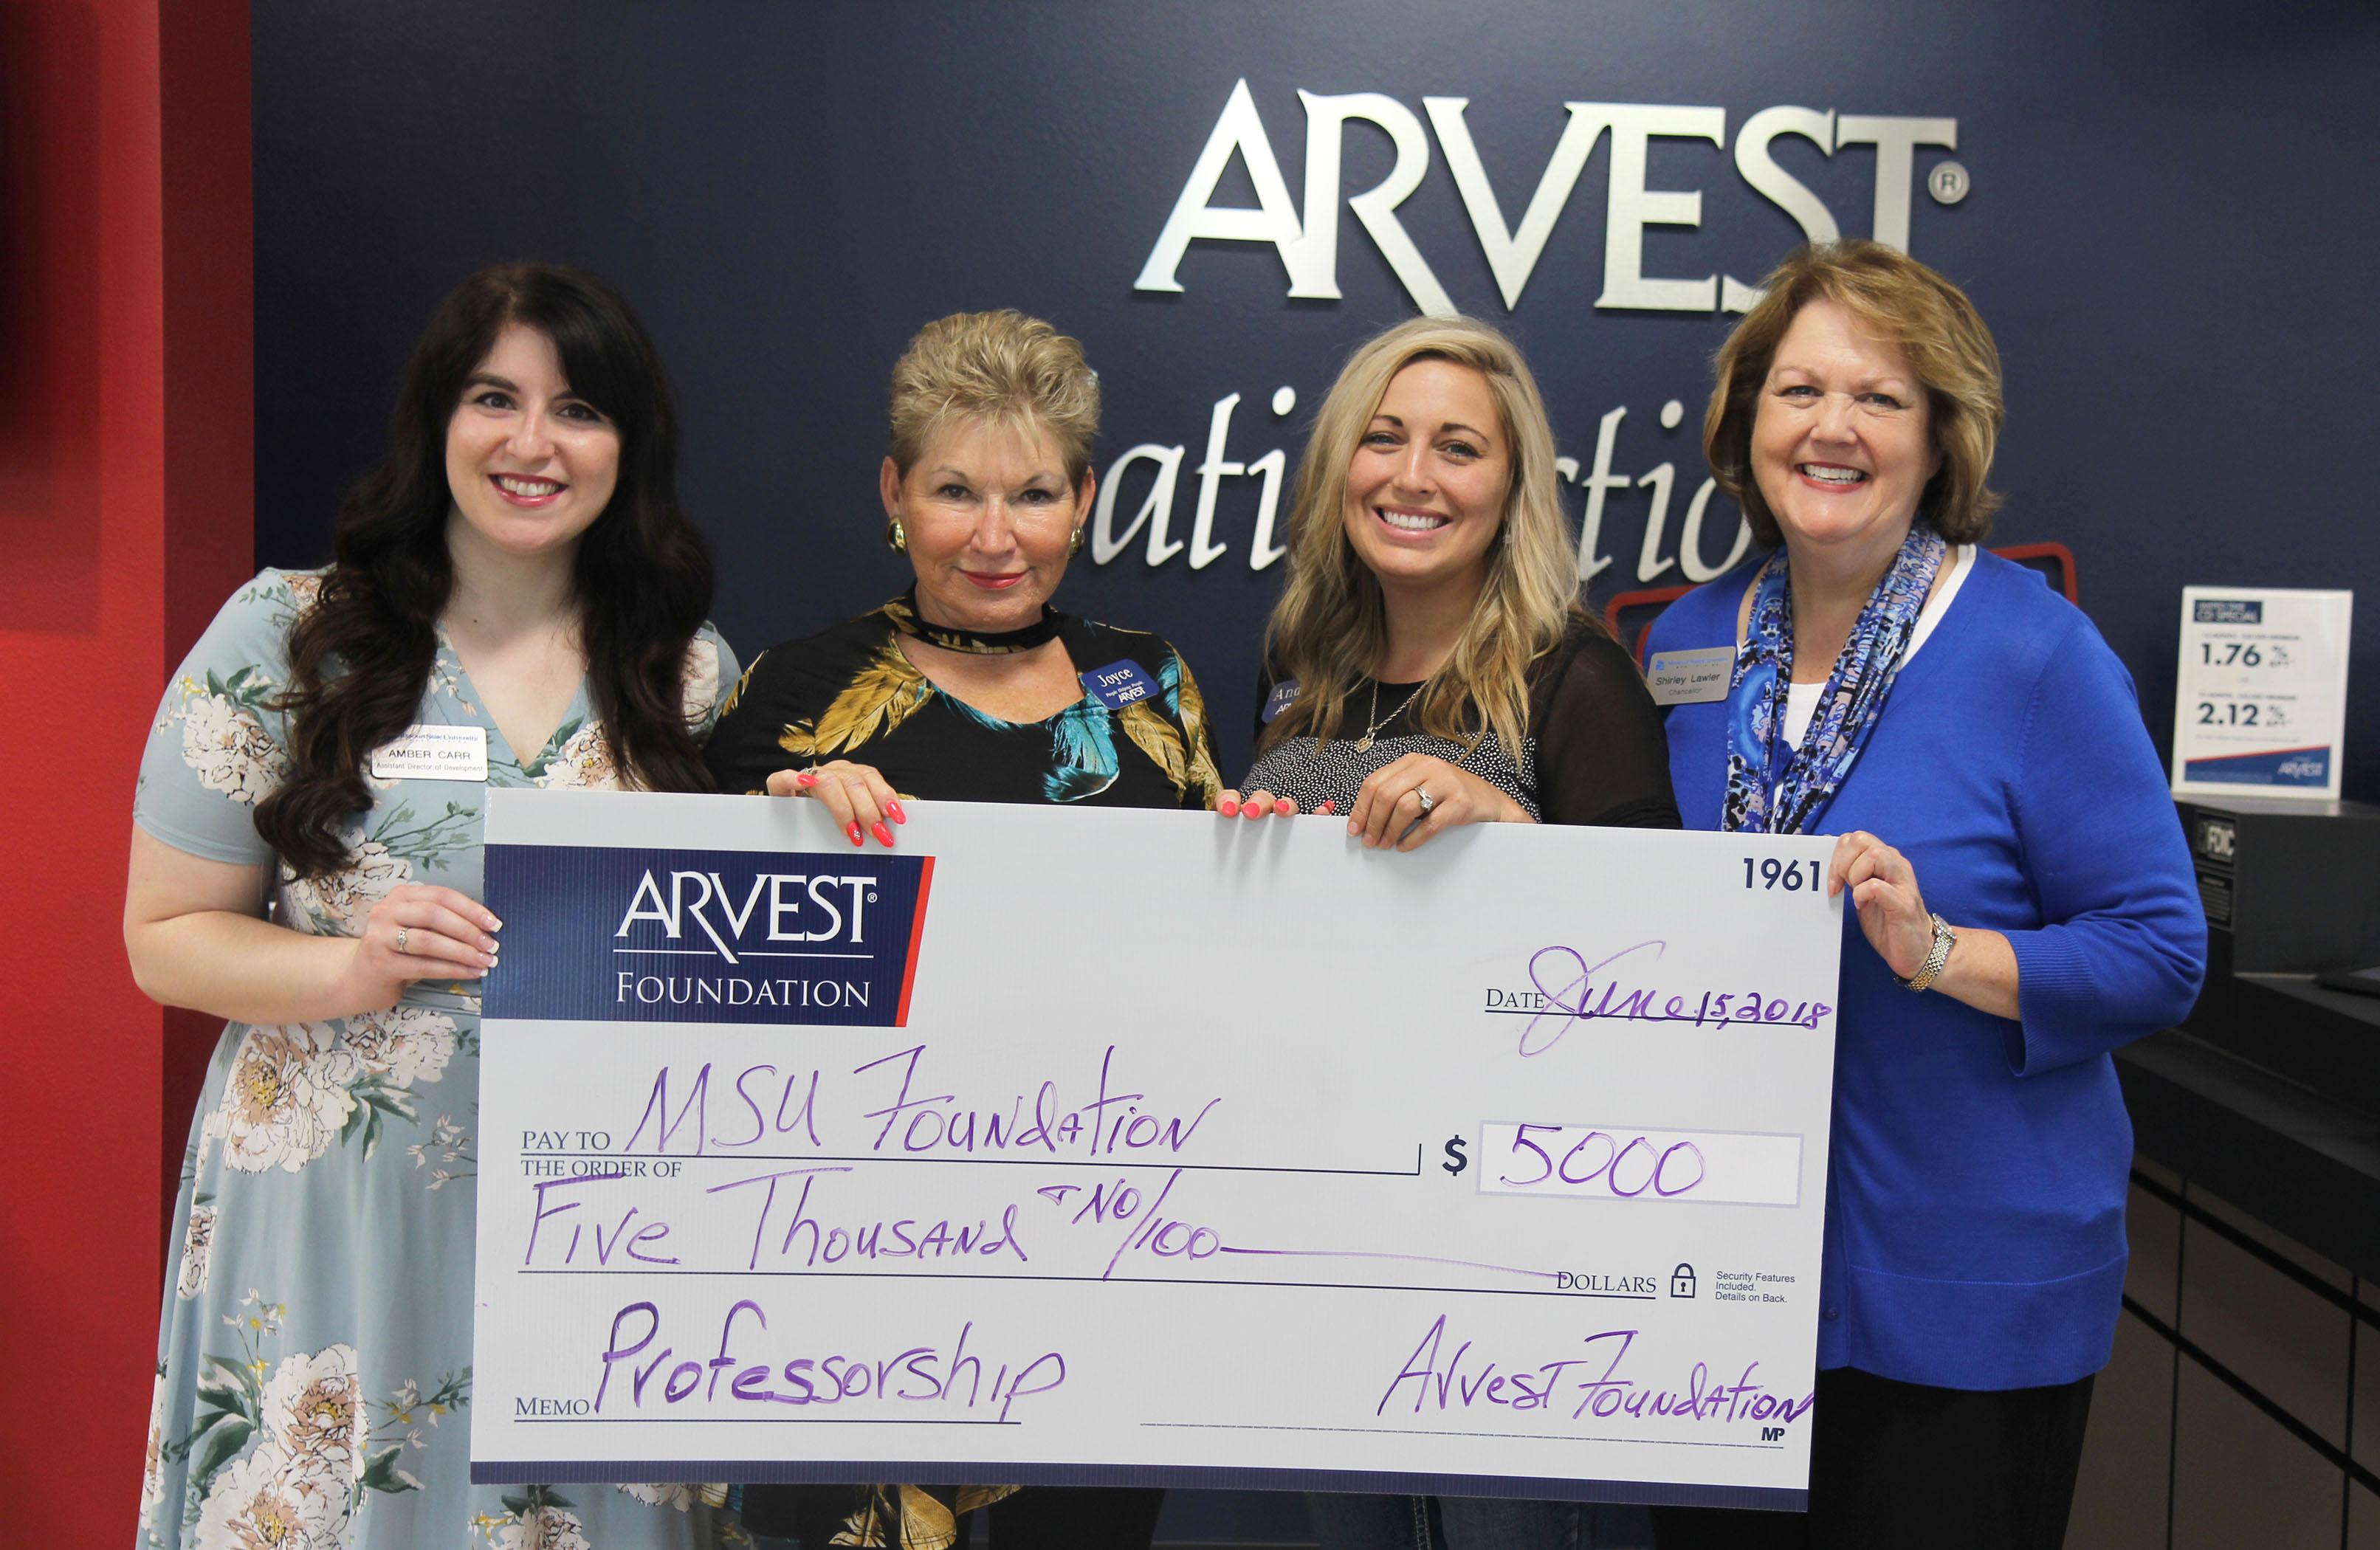 Arvest Bank donates to business professorship - News